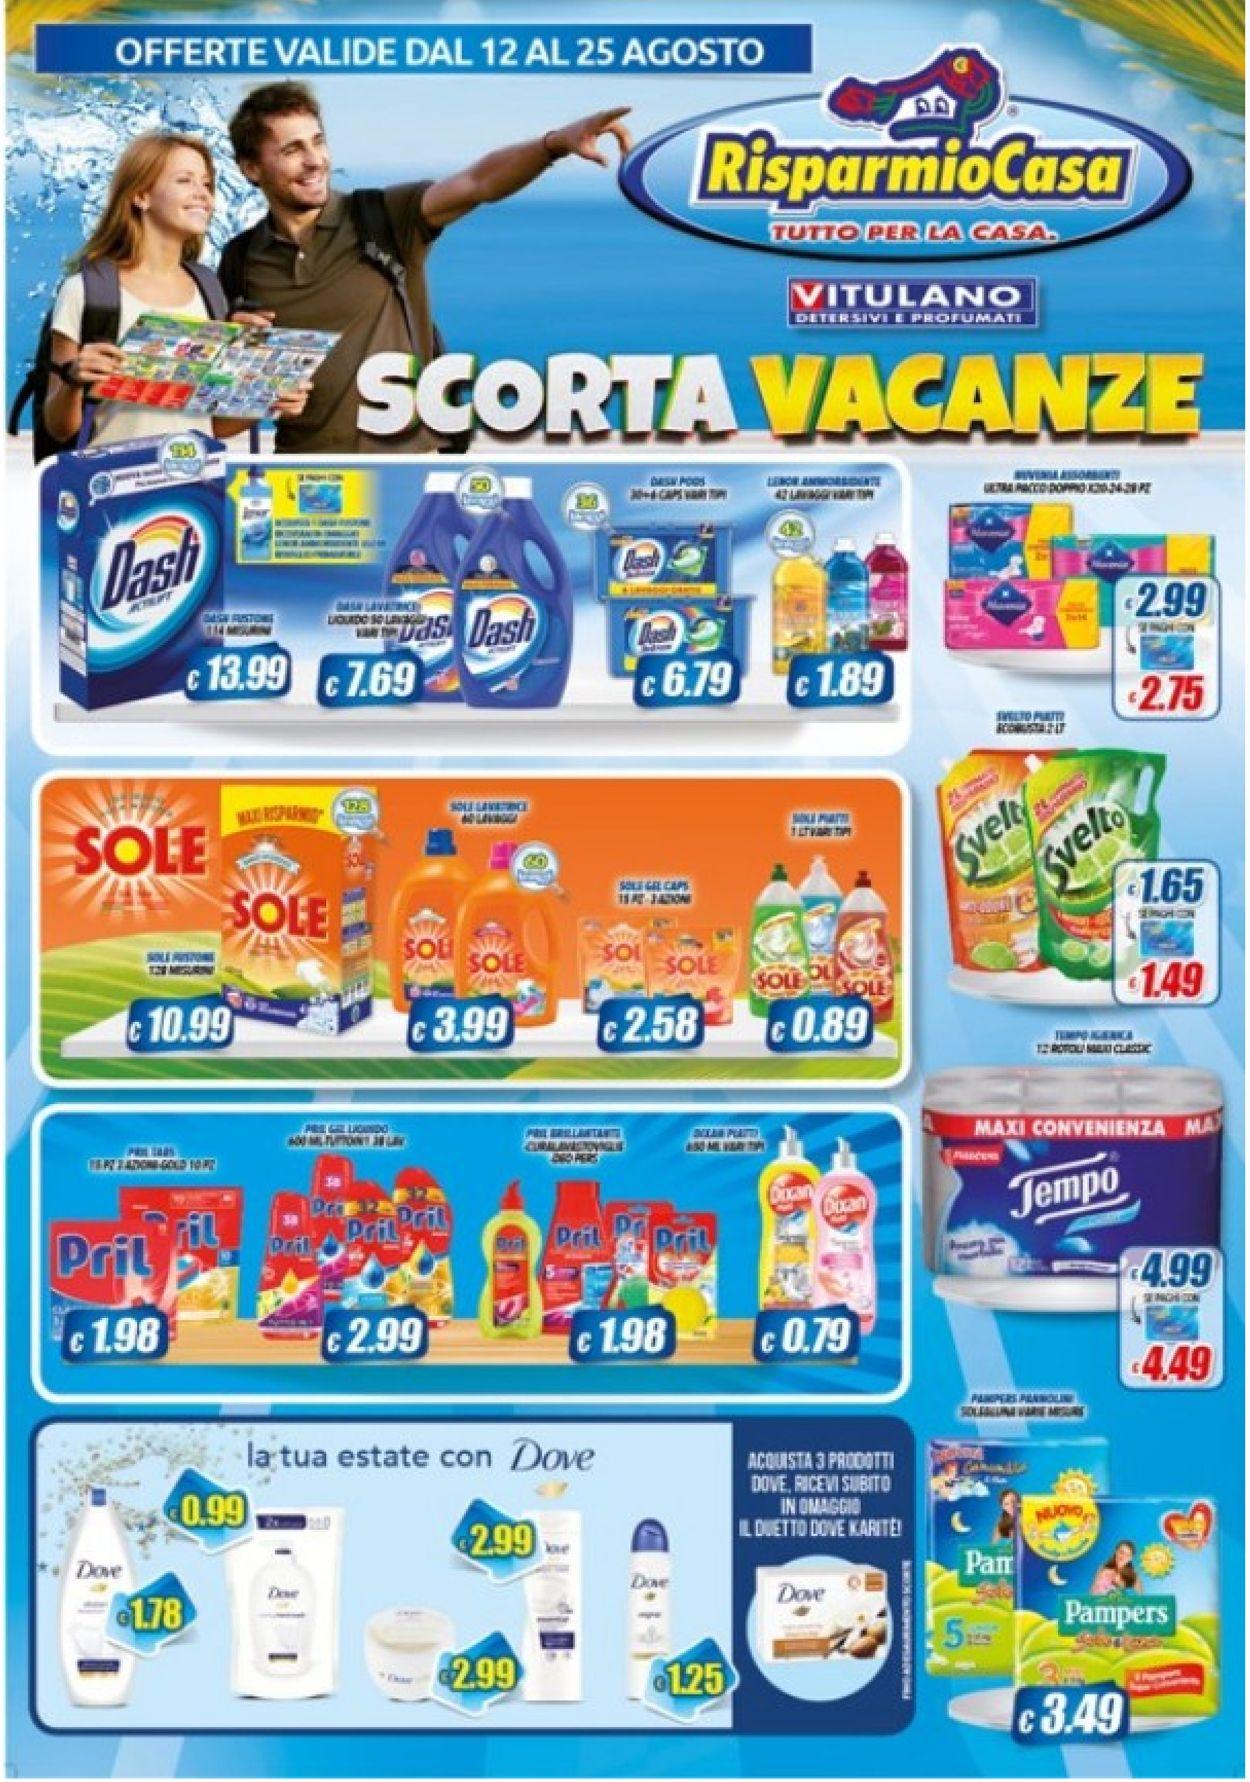 Volantino Risparmio Casa - Offerte 12/08-25/08/2020